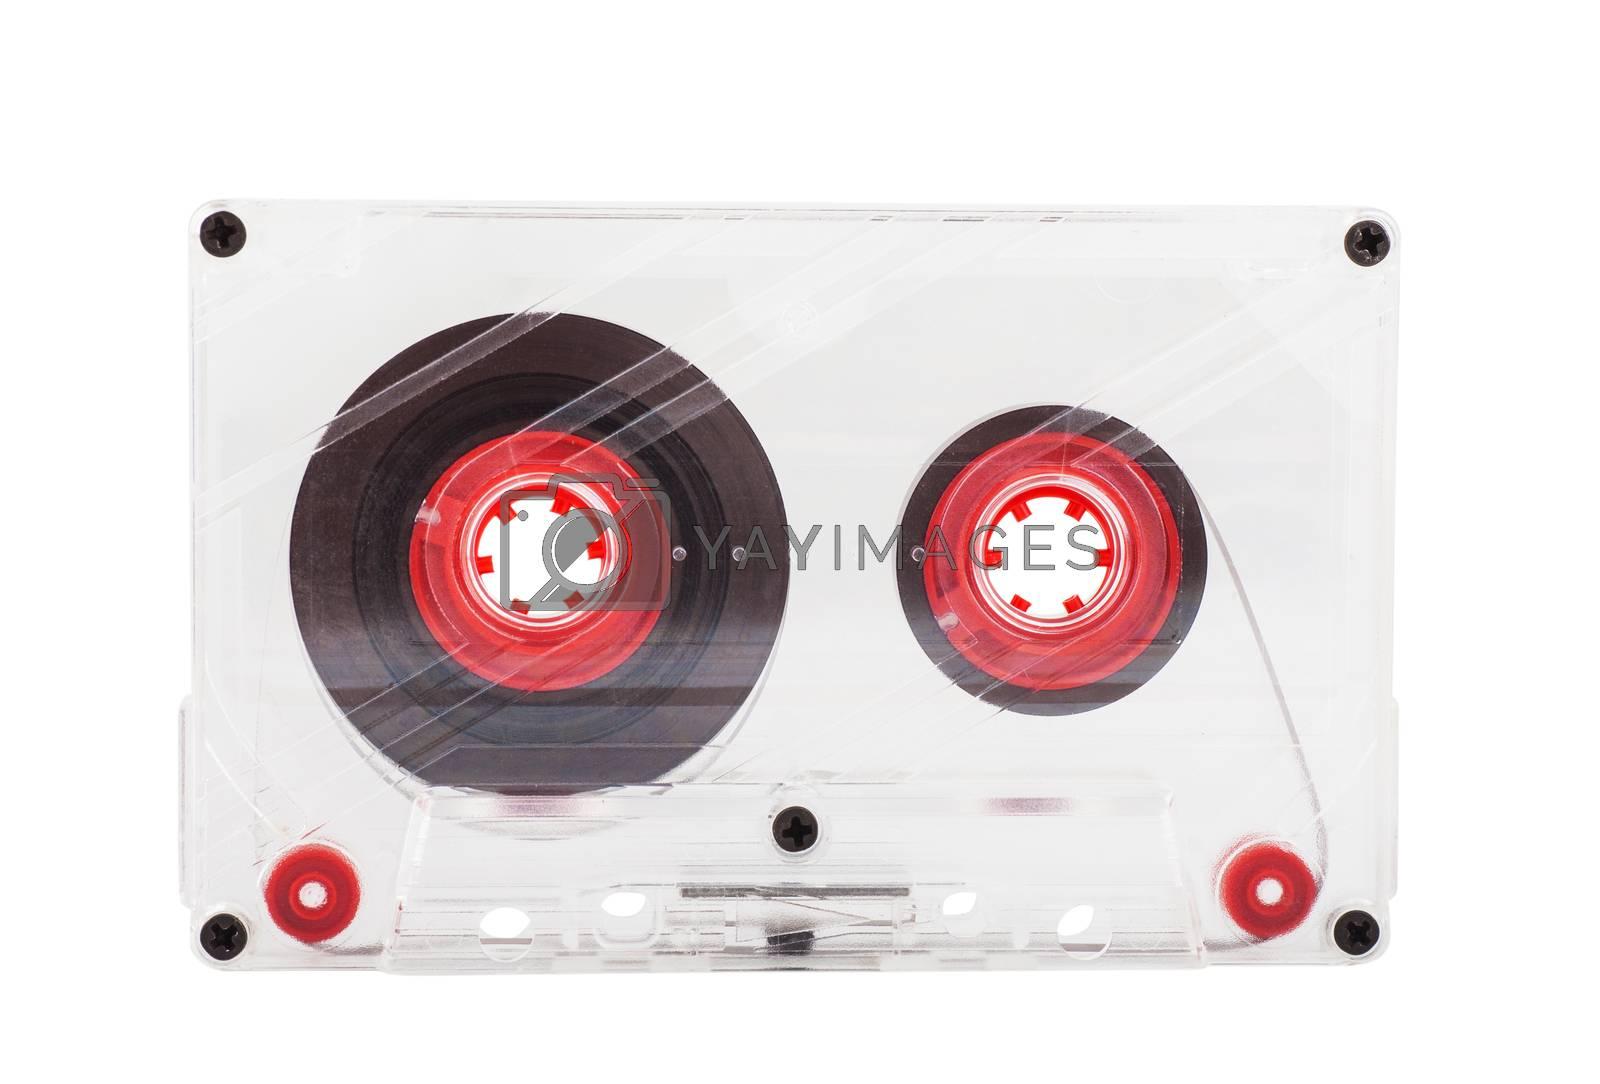 Single audio cassette over white background